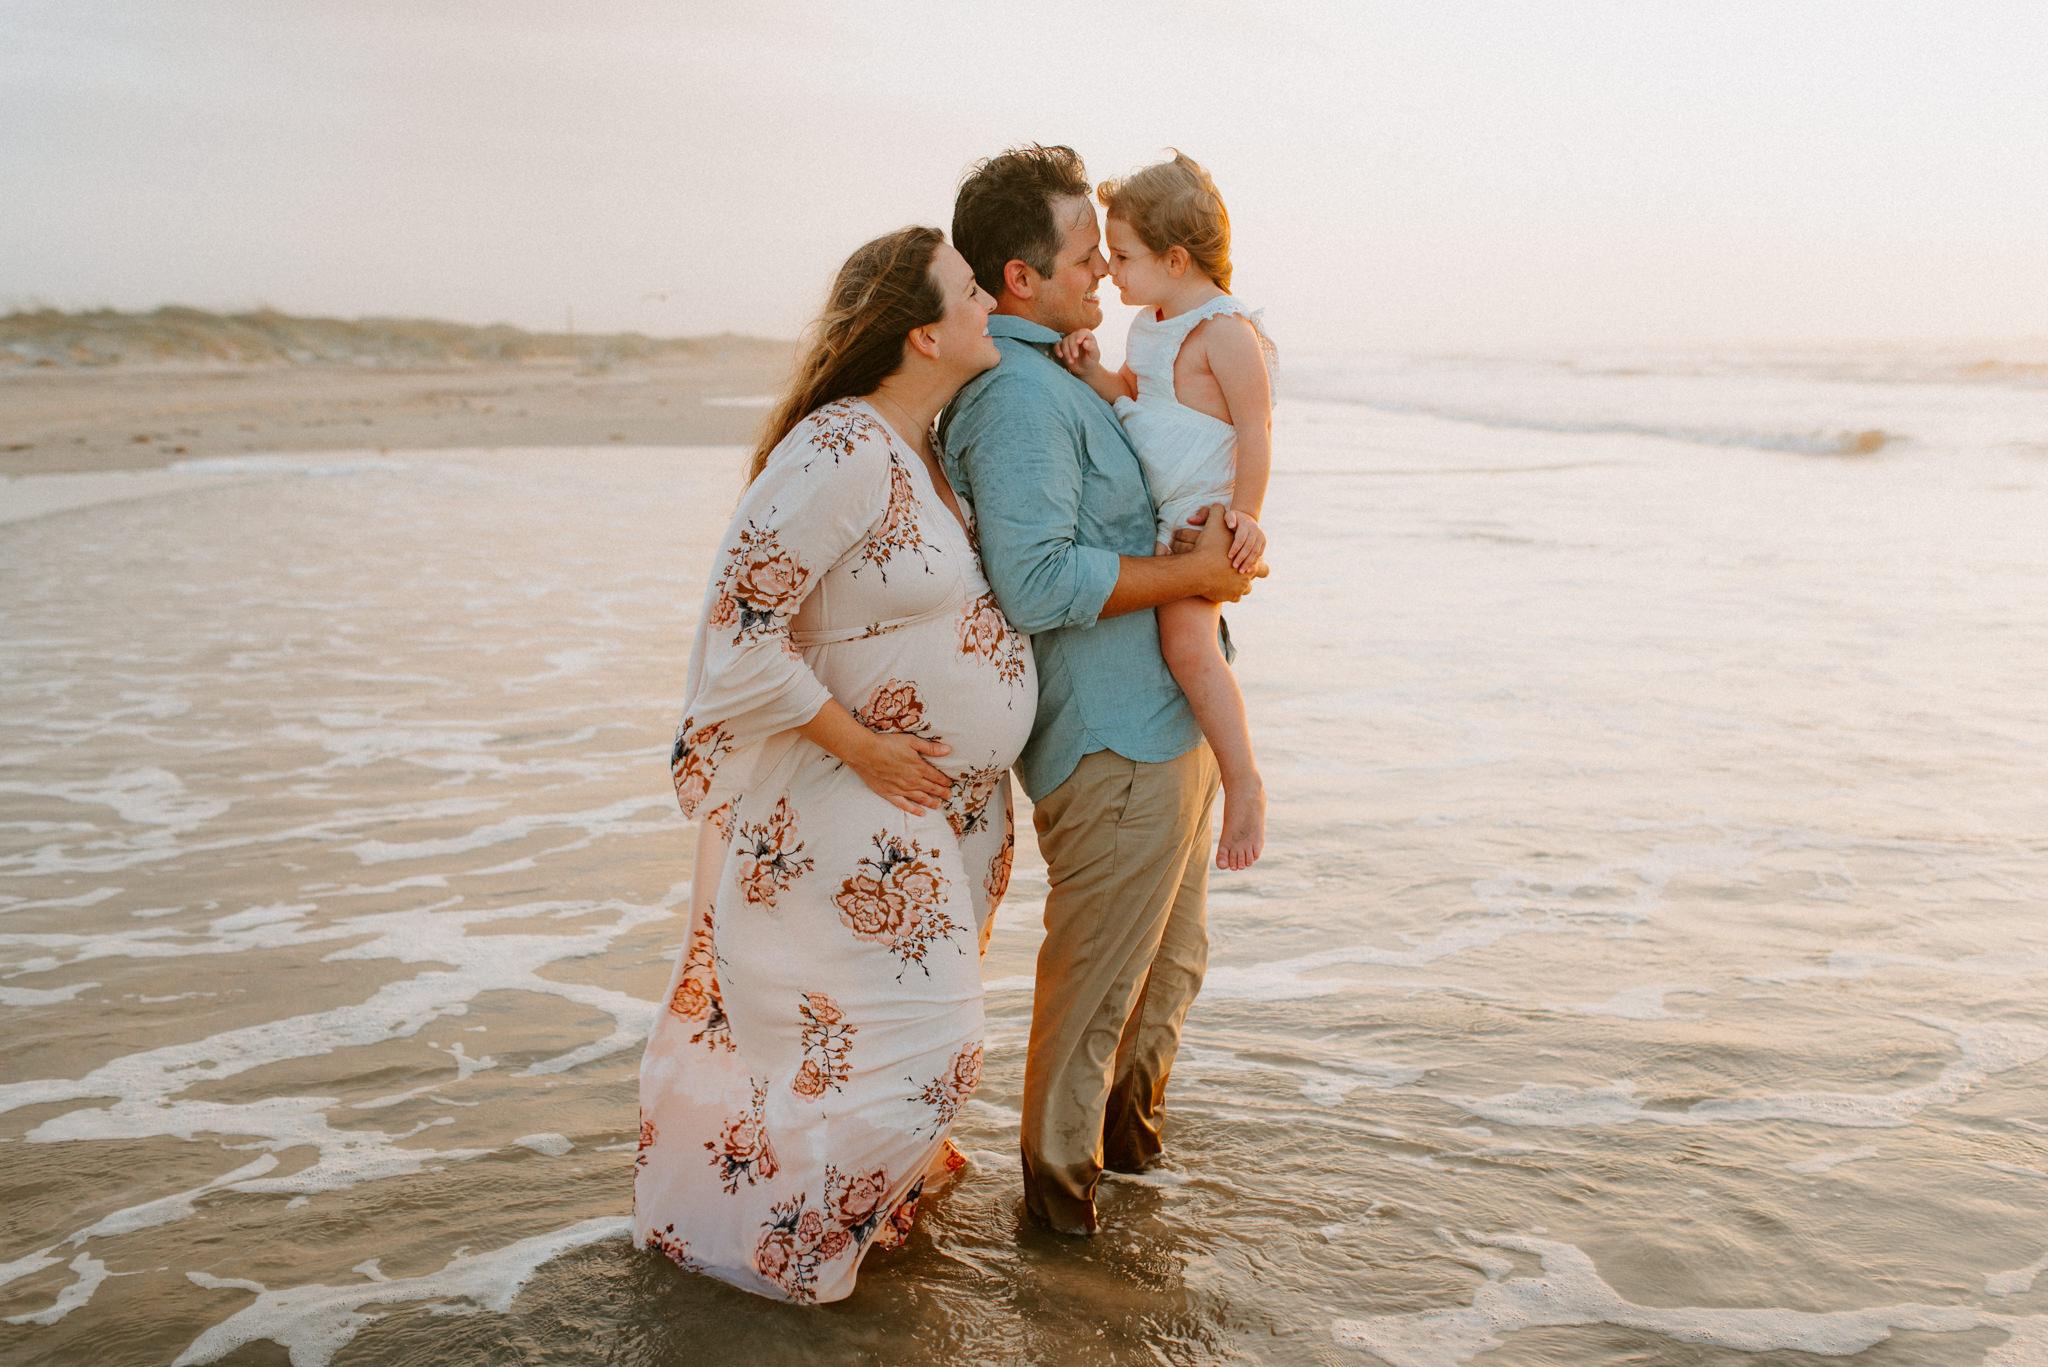 Corpus-Christi-Family-Photographer-Kerlyn-Van-Gelder-Photography62.jpg